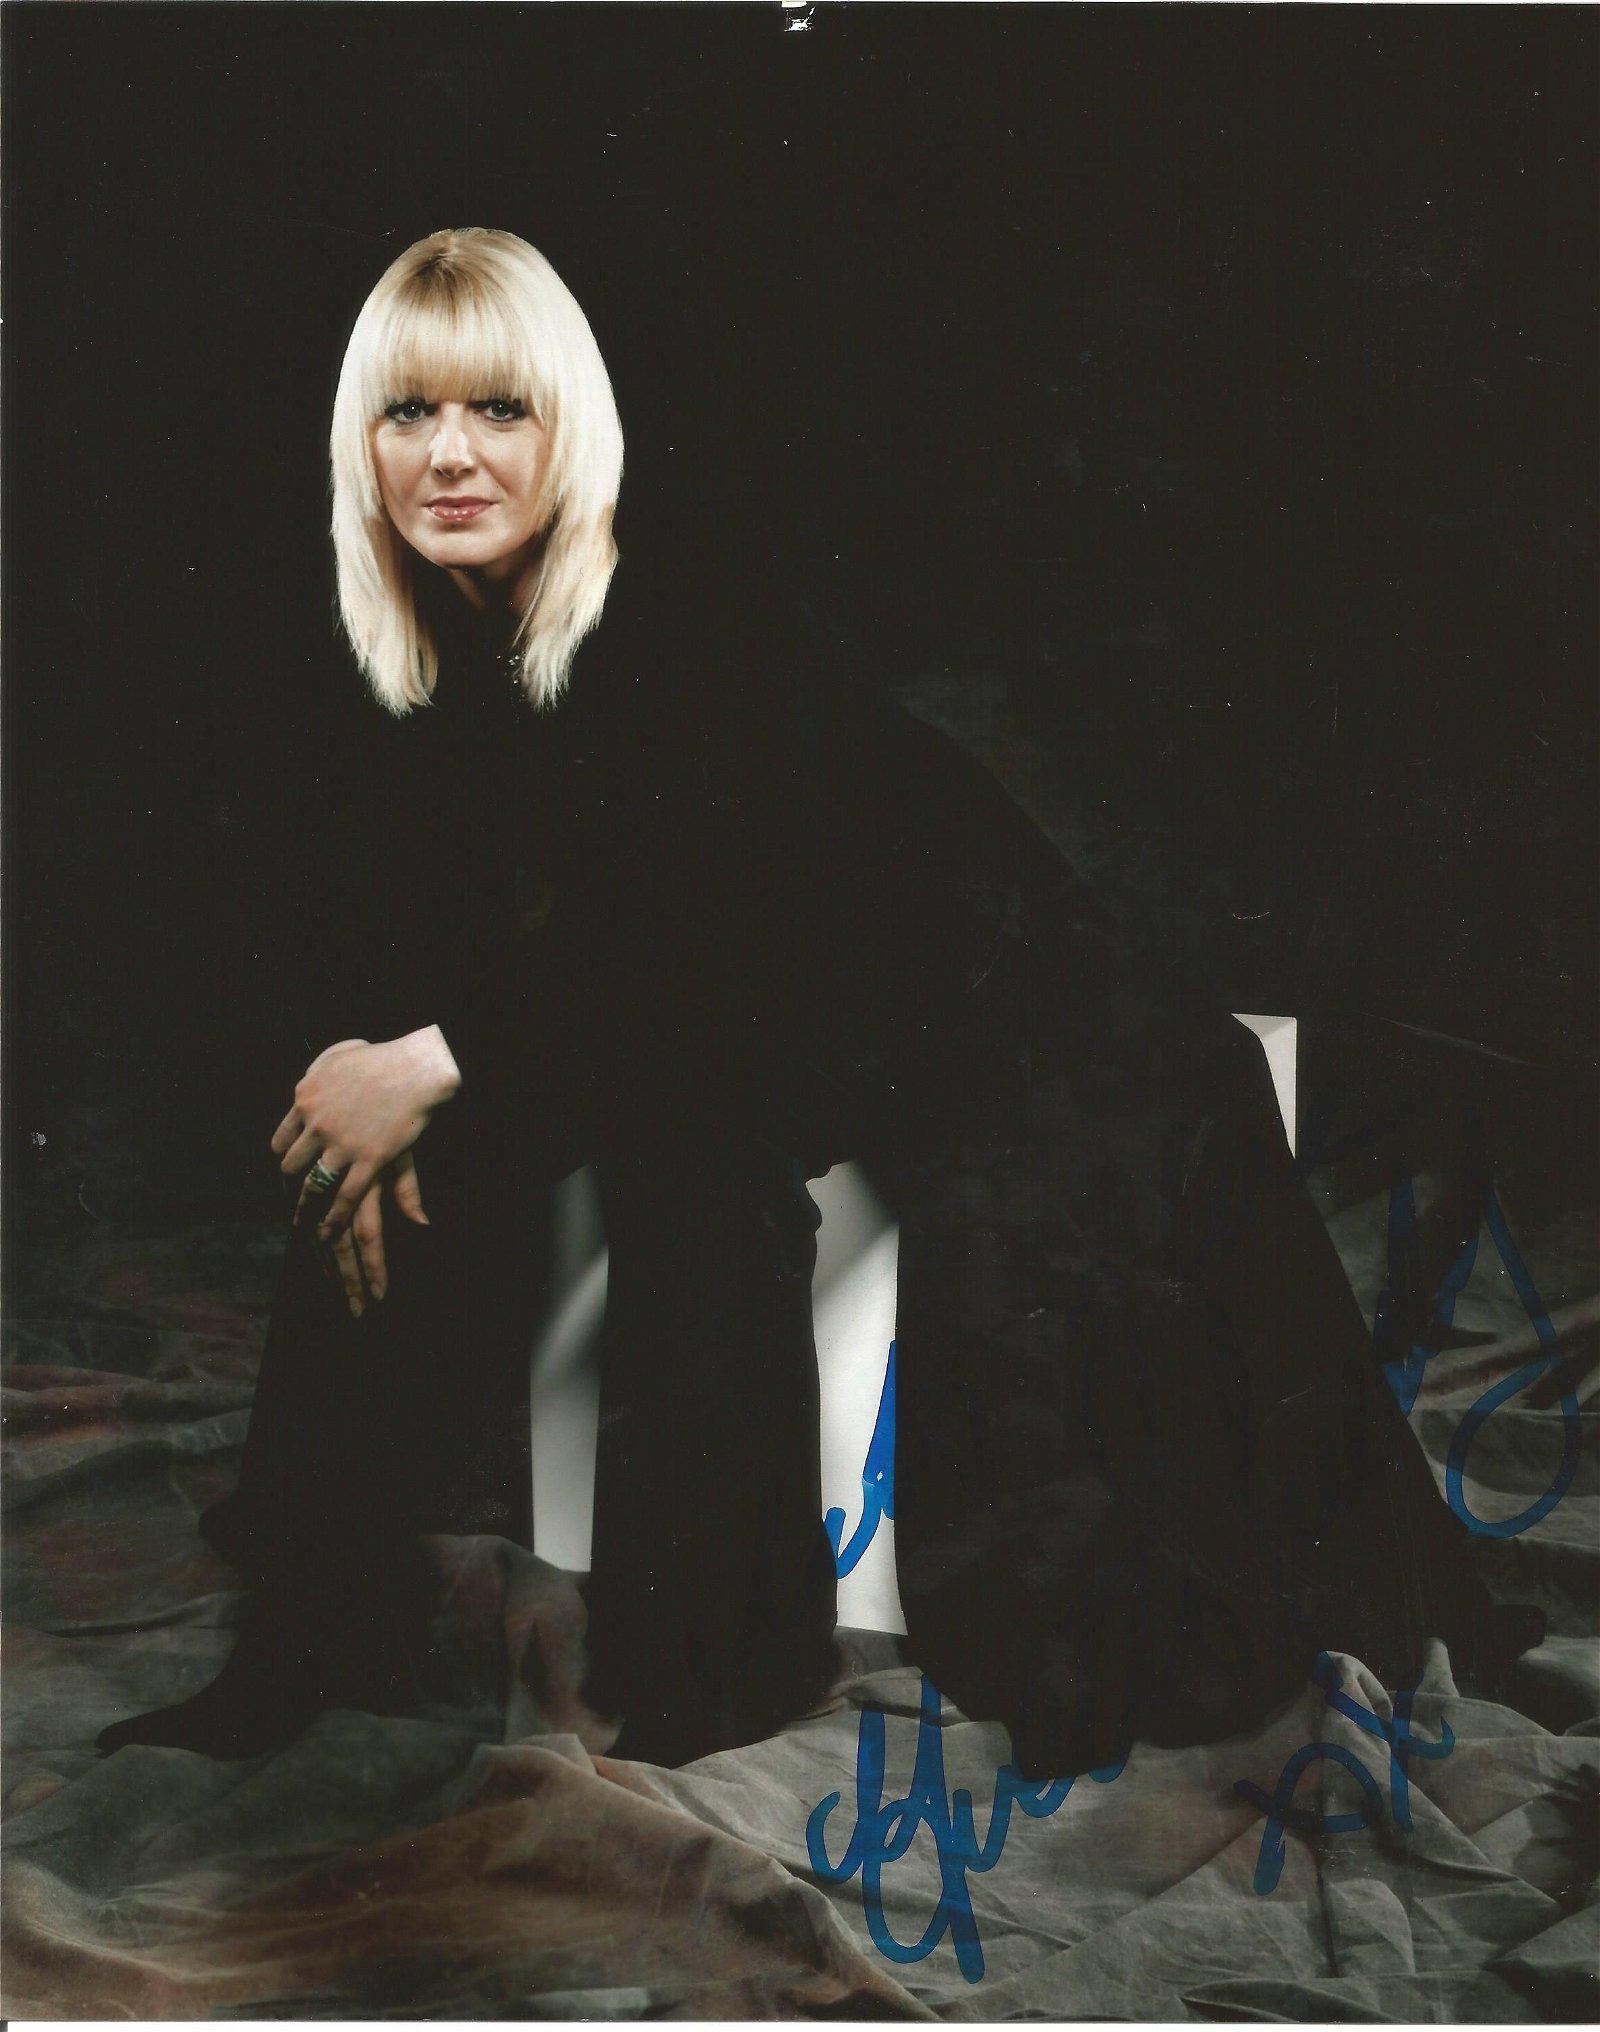 Yvette Fielding signed 10 x 8 colour Photoshoot